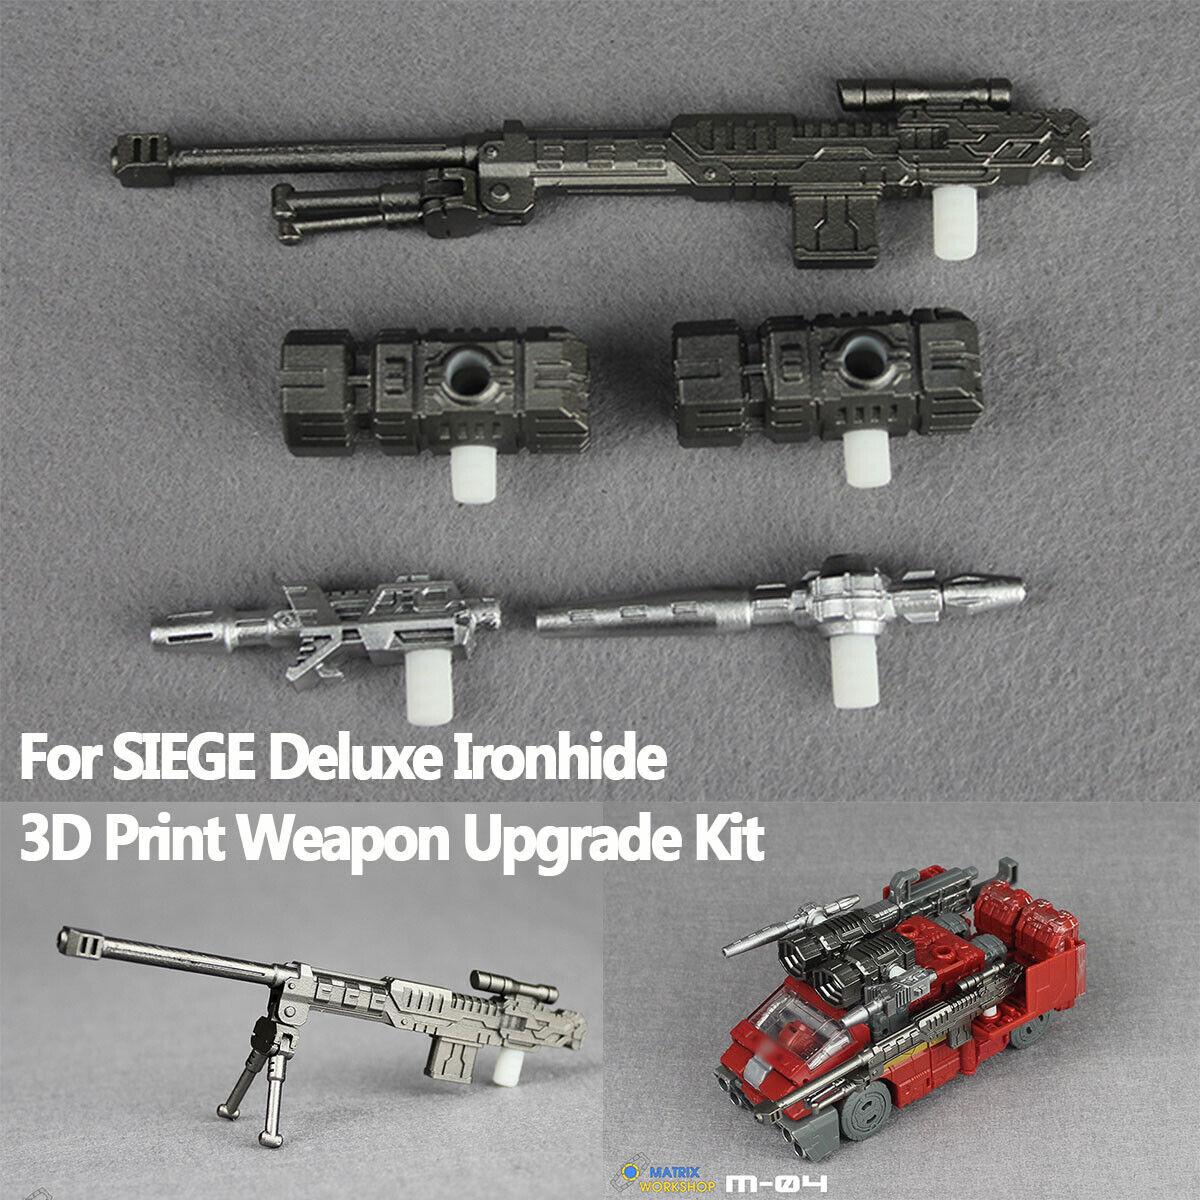 Transformation Matrix Workshop M-11 Upgrade Kit For Siege Deluxe Prowl